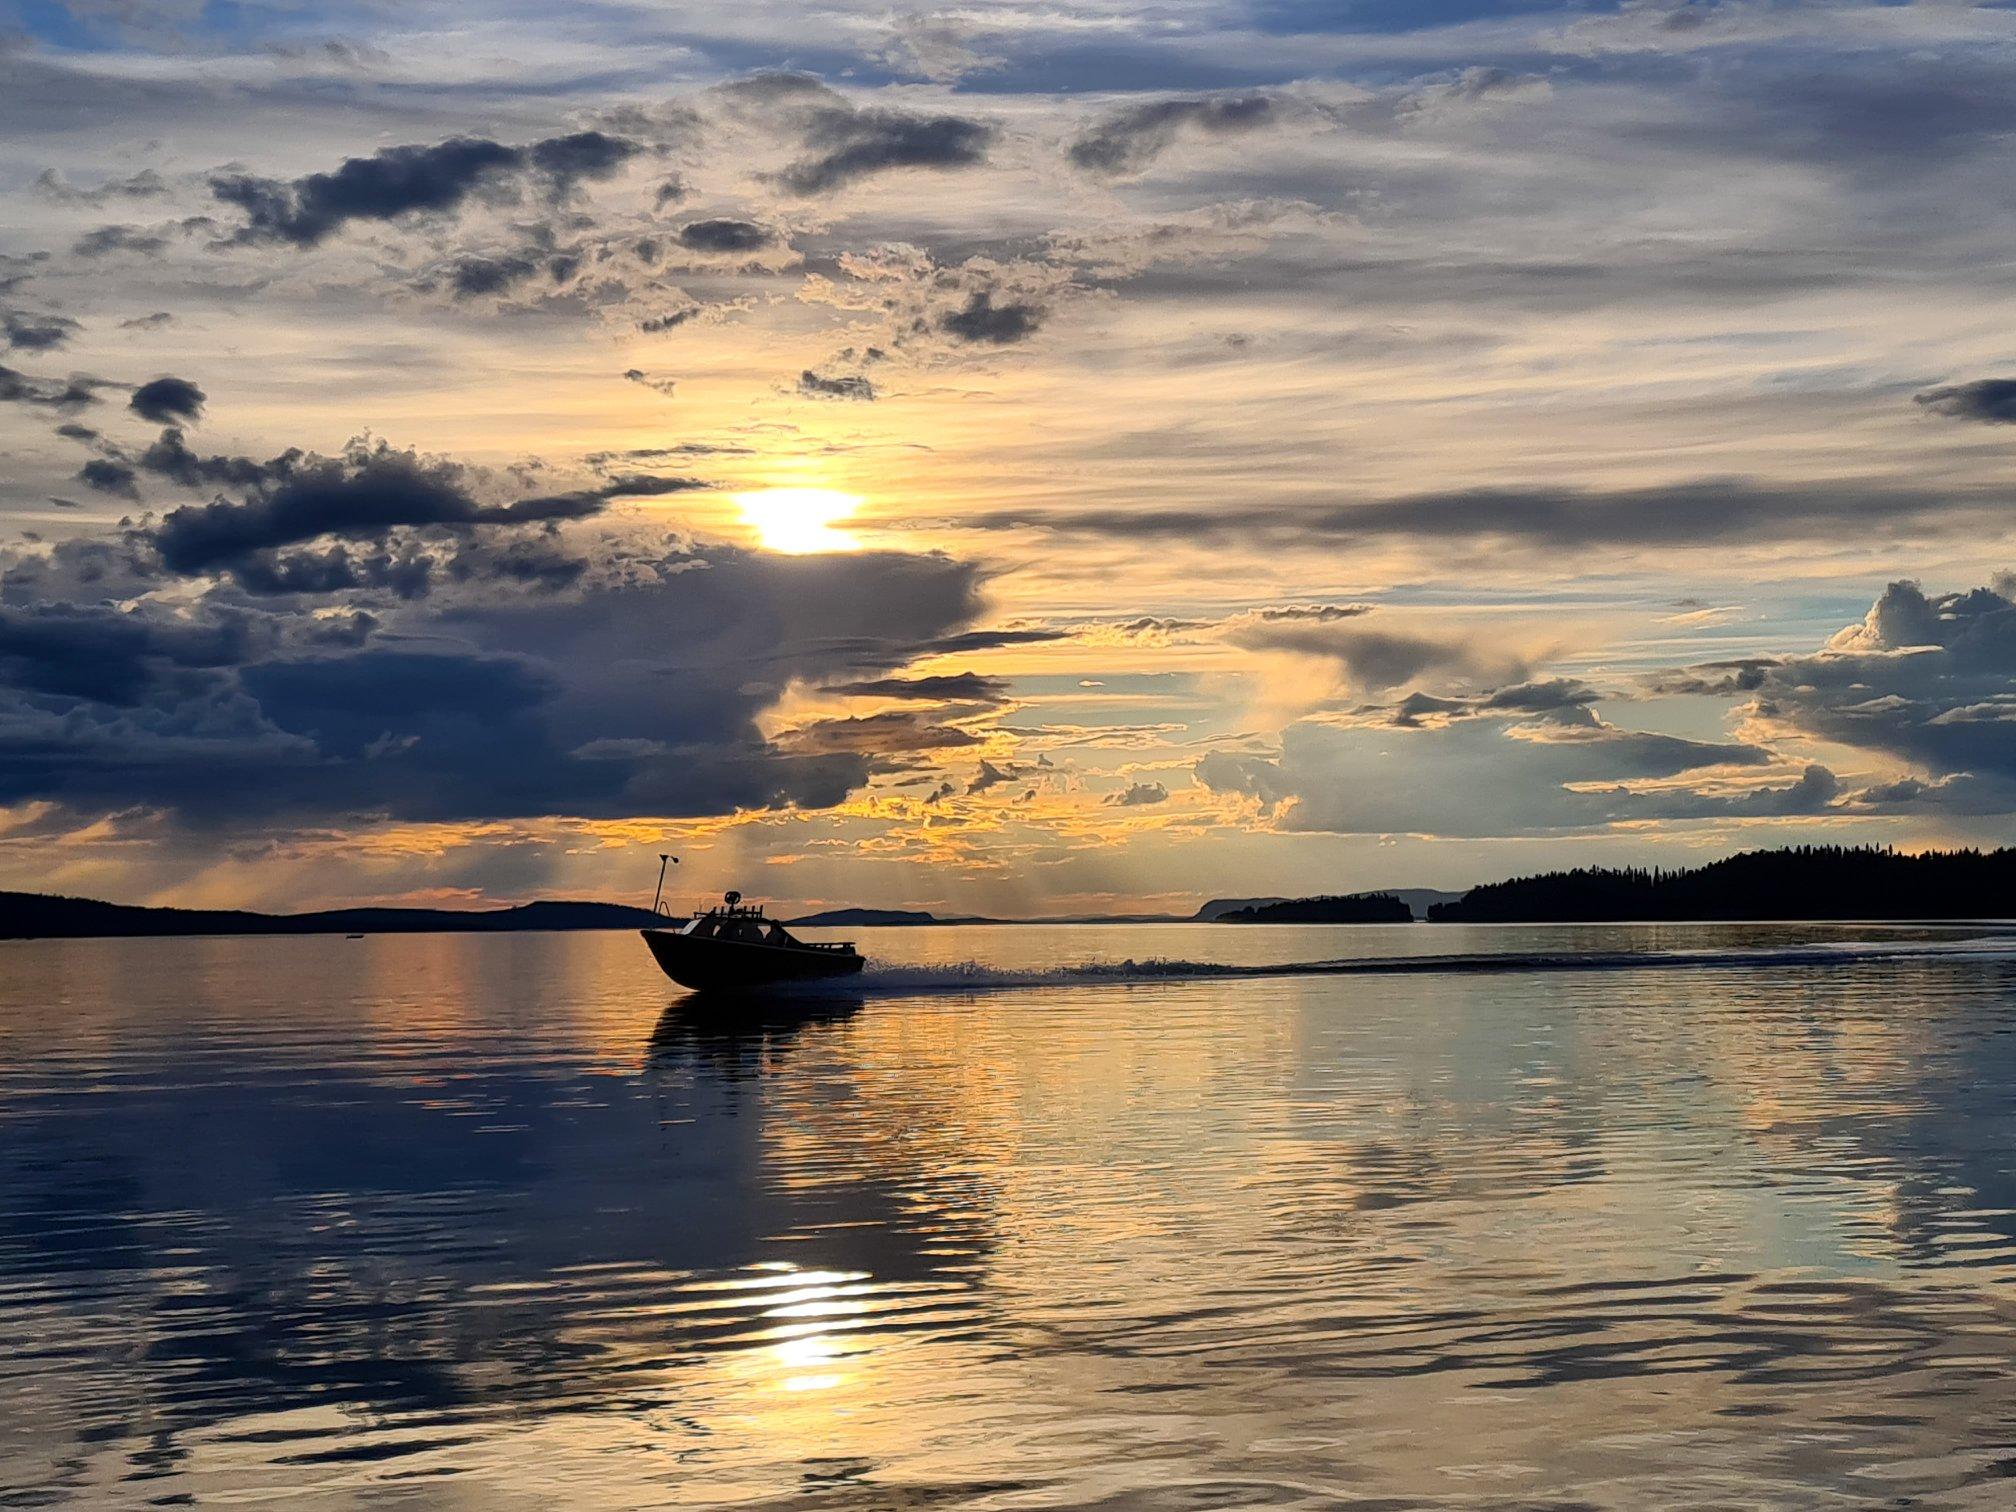 Båtliv på sjön Storuman